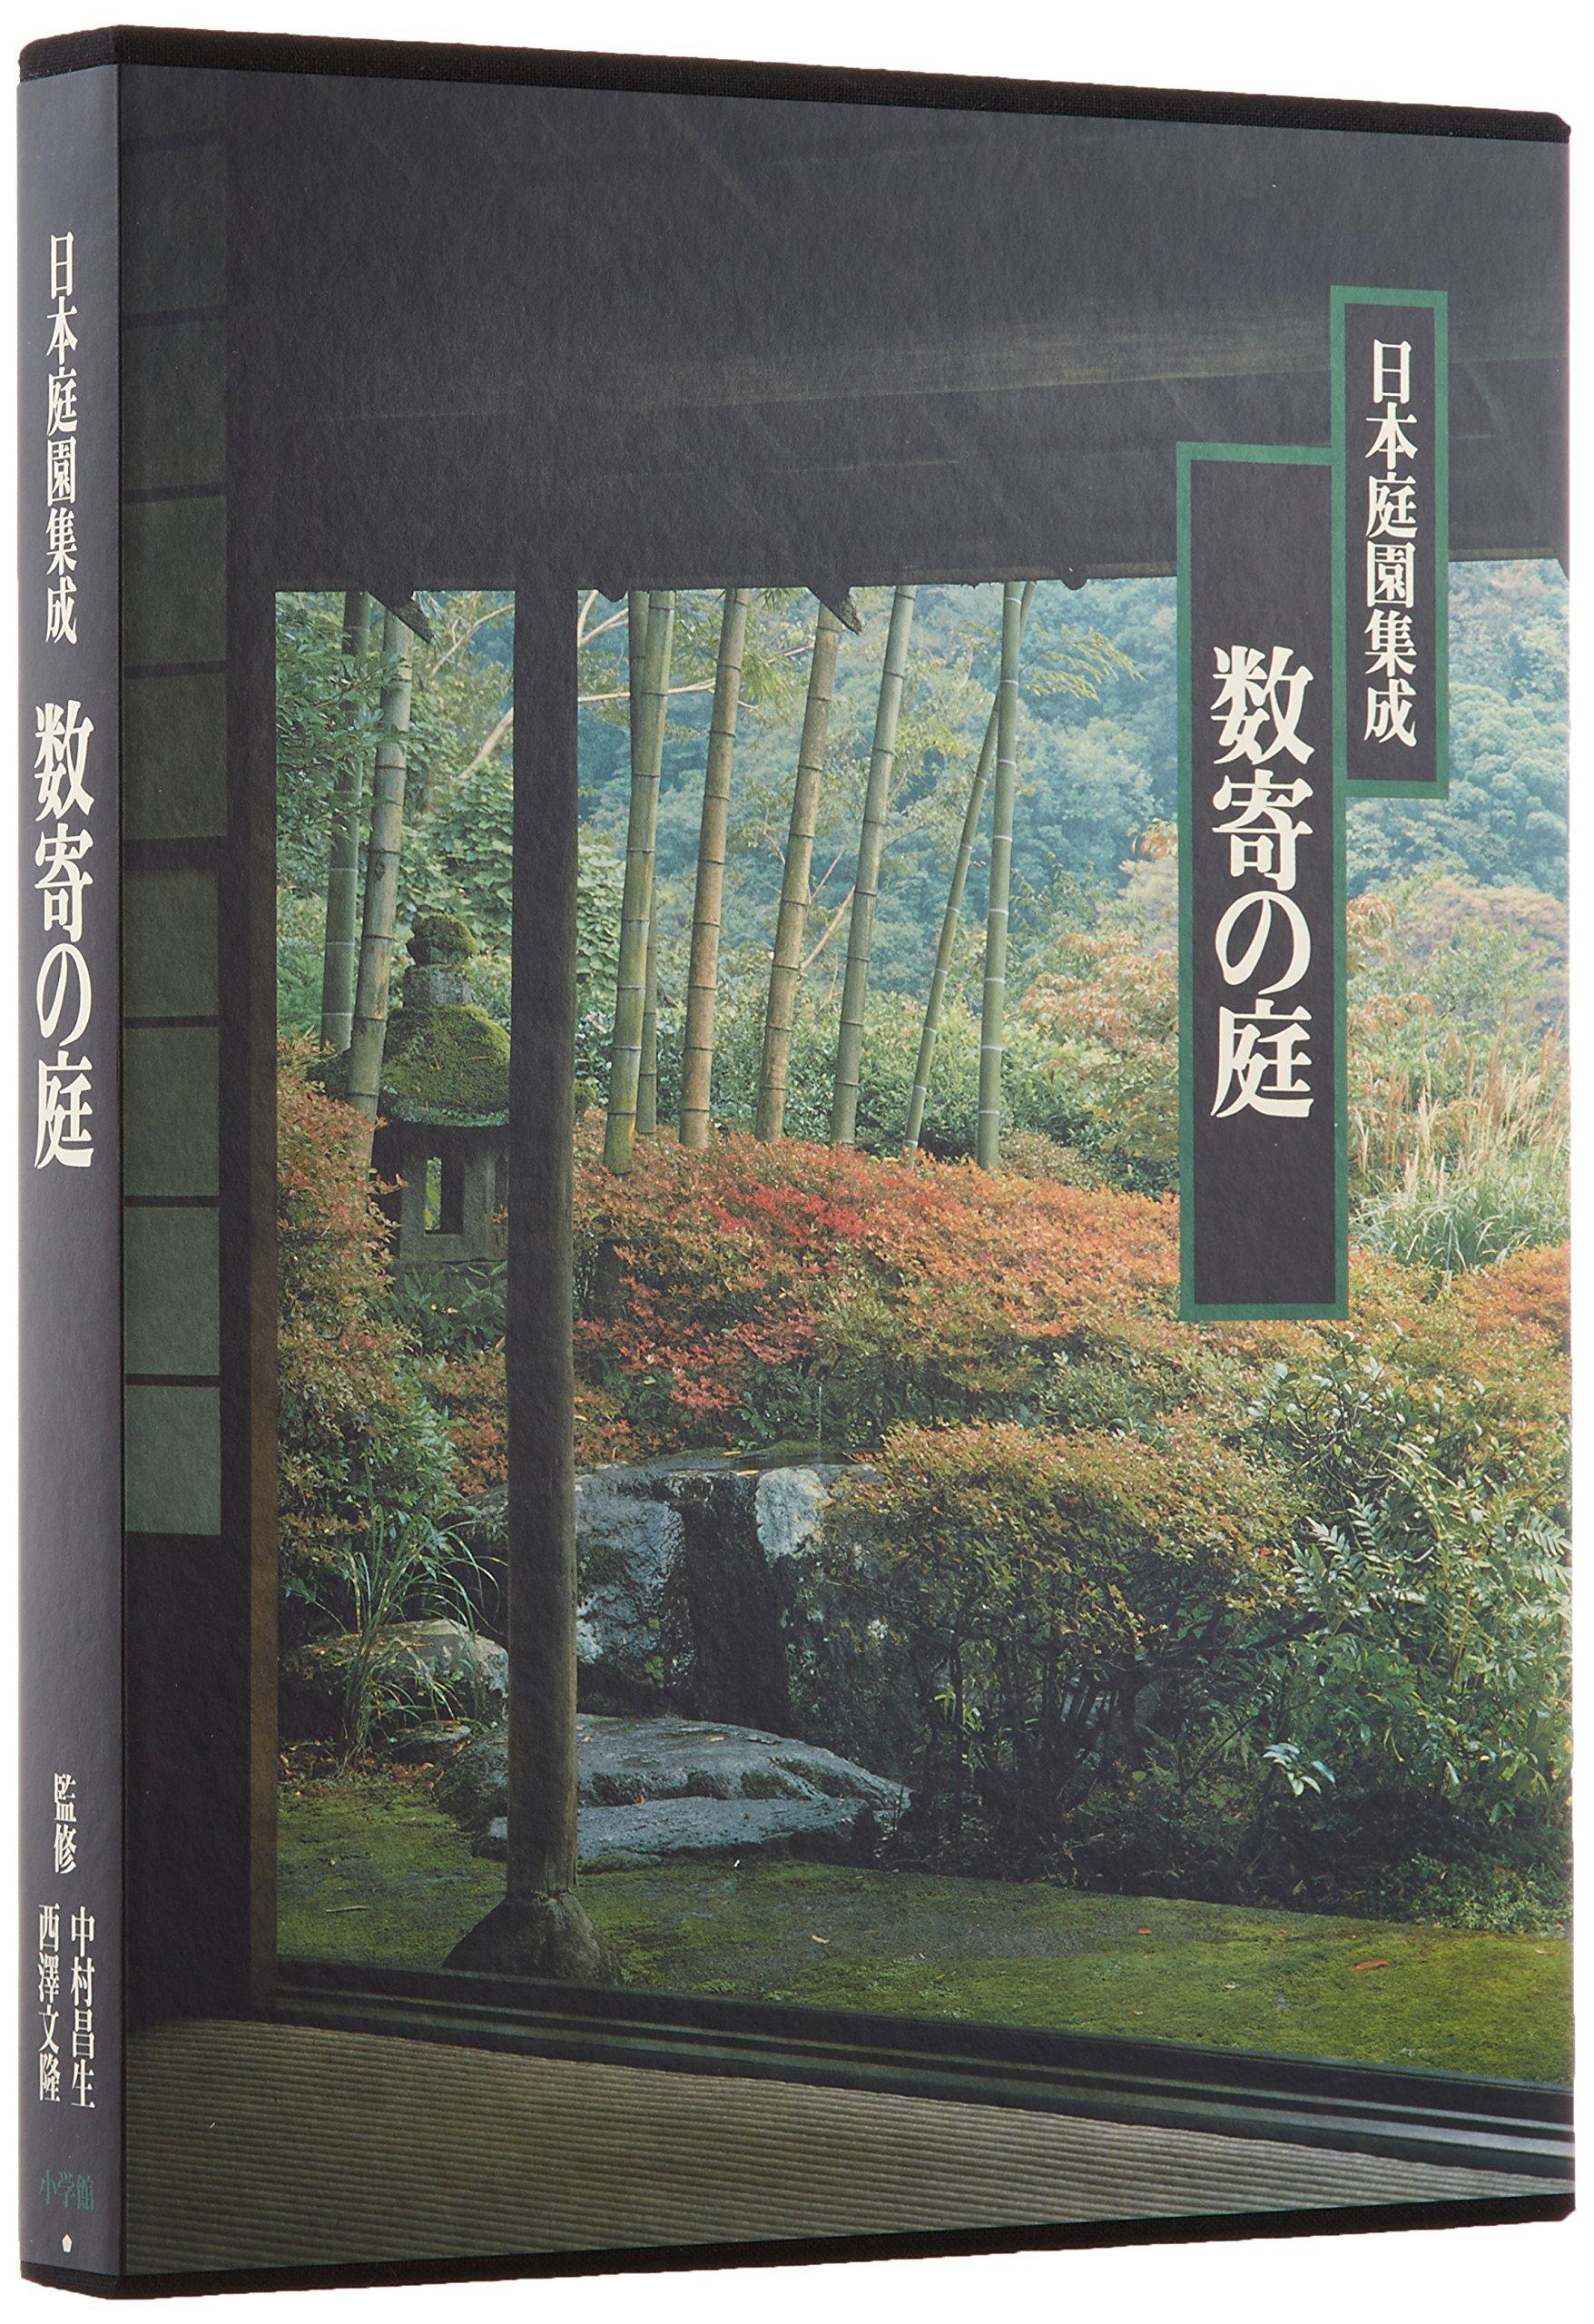 Garden, Volume 1 Suki Japanese garden aggregation (1985) ISBN: 4095610018 [Japanese Import]